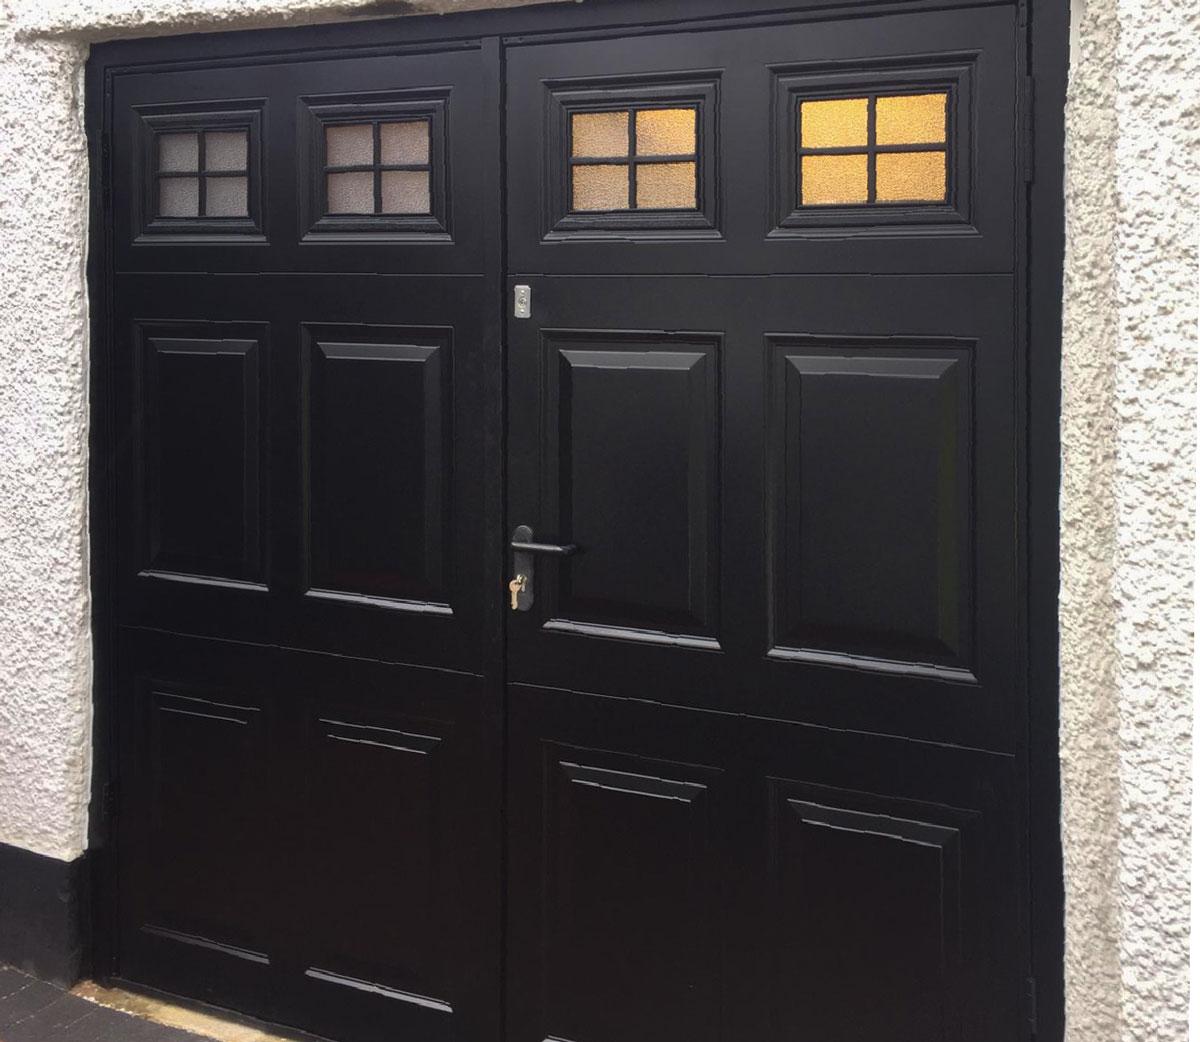 Garador Beautmont / Hormann Promatic / Side-Hinged Garage Door